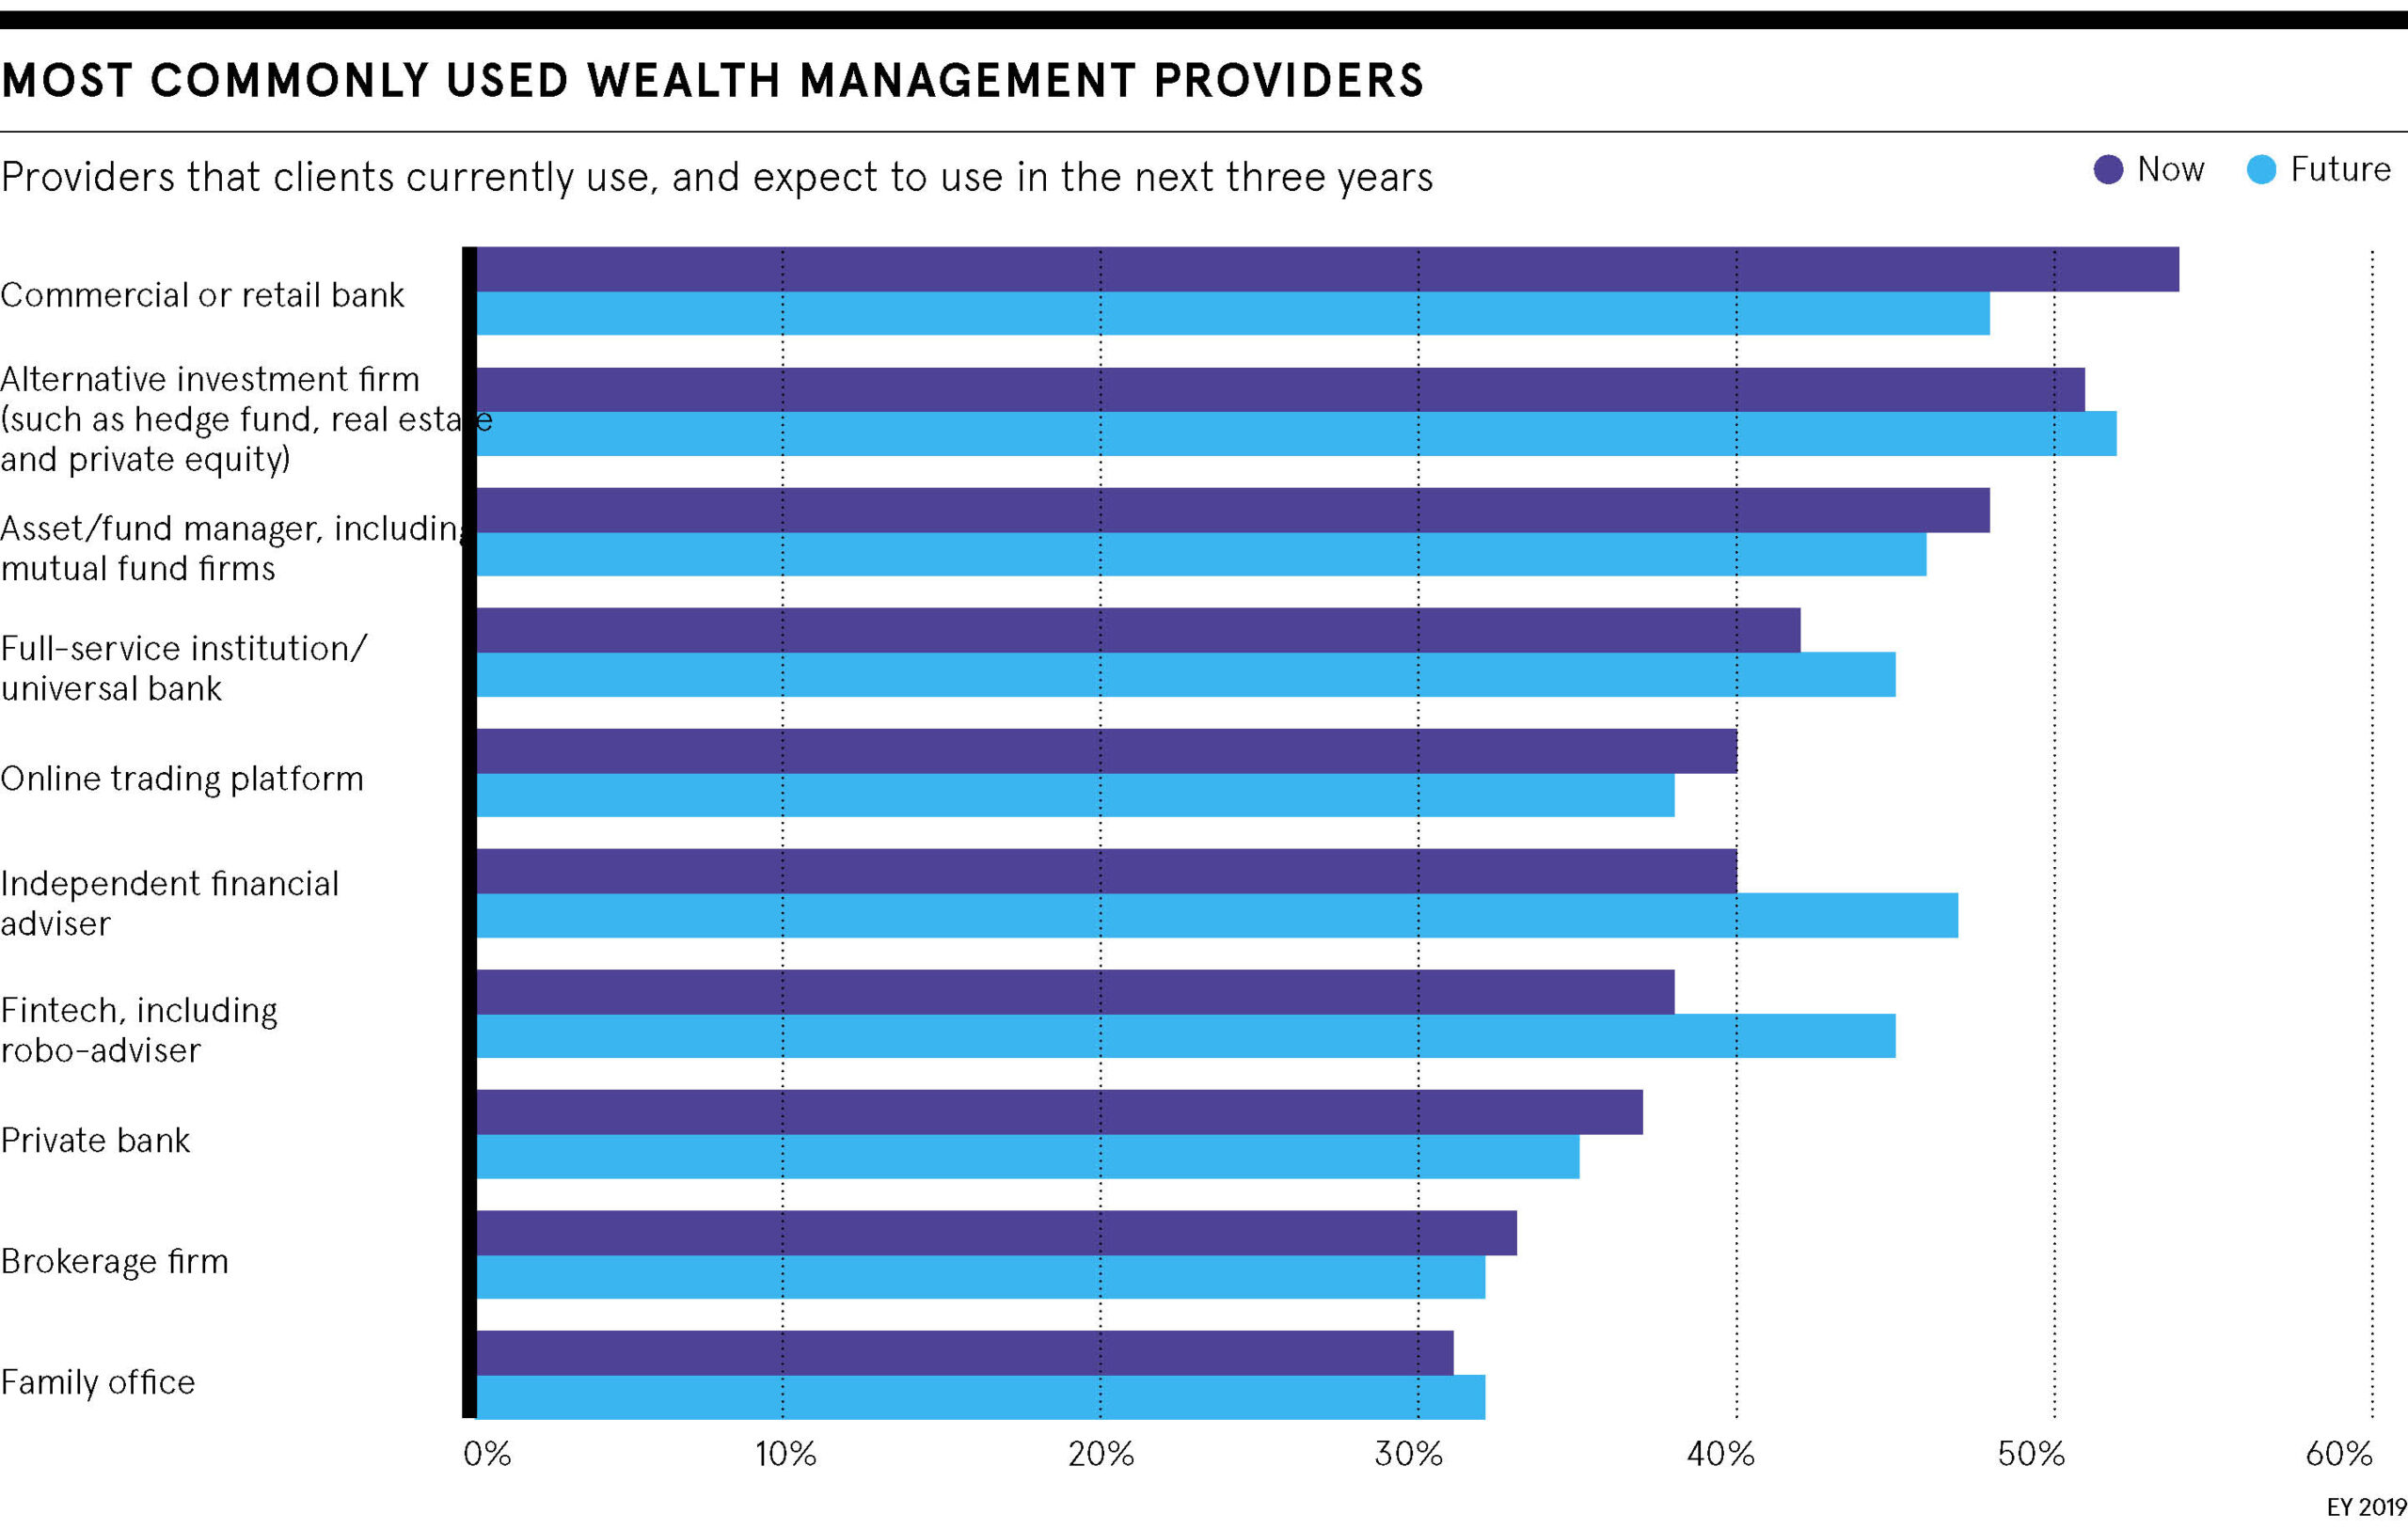 Wealth providers